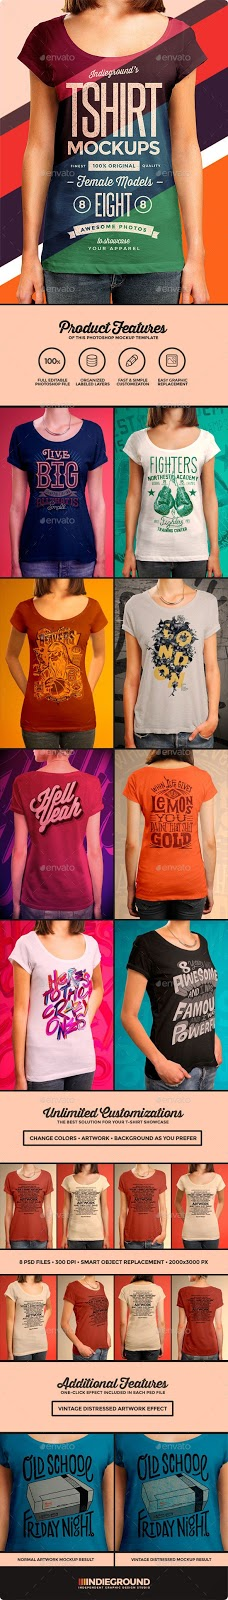 5. Women T-Shirt Mockups